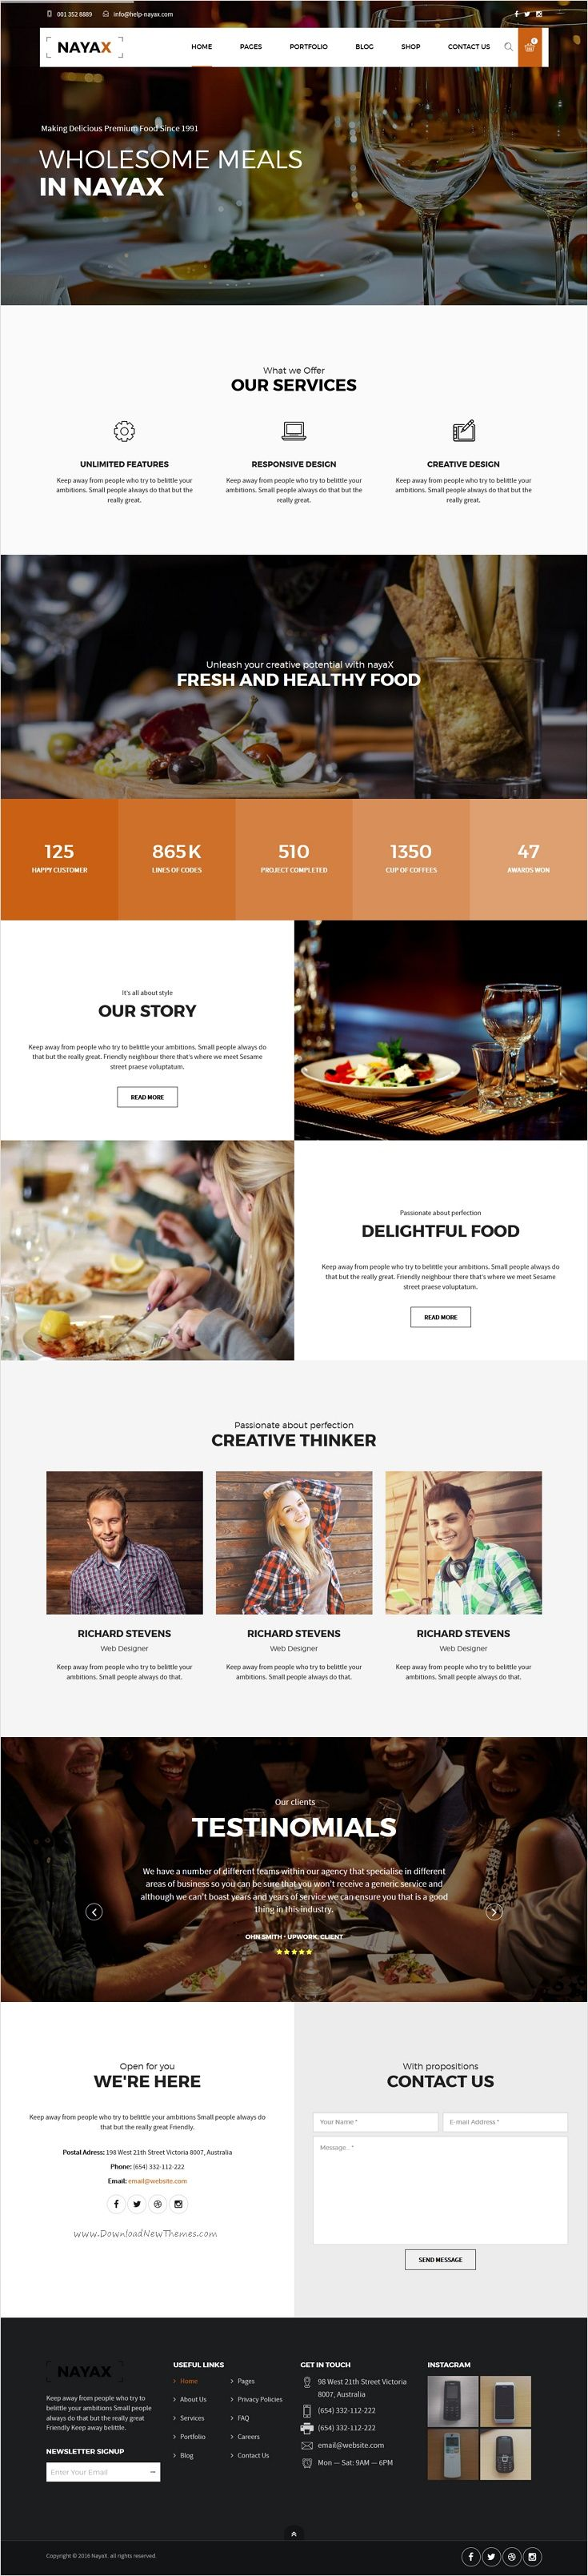 Nayax is beautifully design 12 in 1 responsive #WordPress theme for multipurpose #food #cafe and restaurant website download now➩ https://themeforest.net/item/nayax-creative-modern-multipurpose/16771207?ref=Datasata